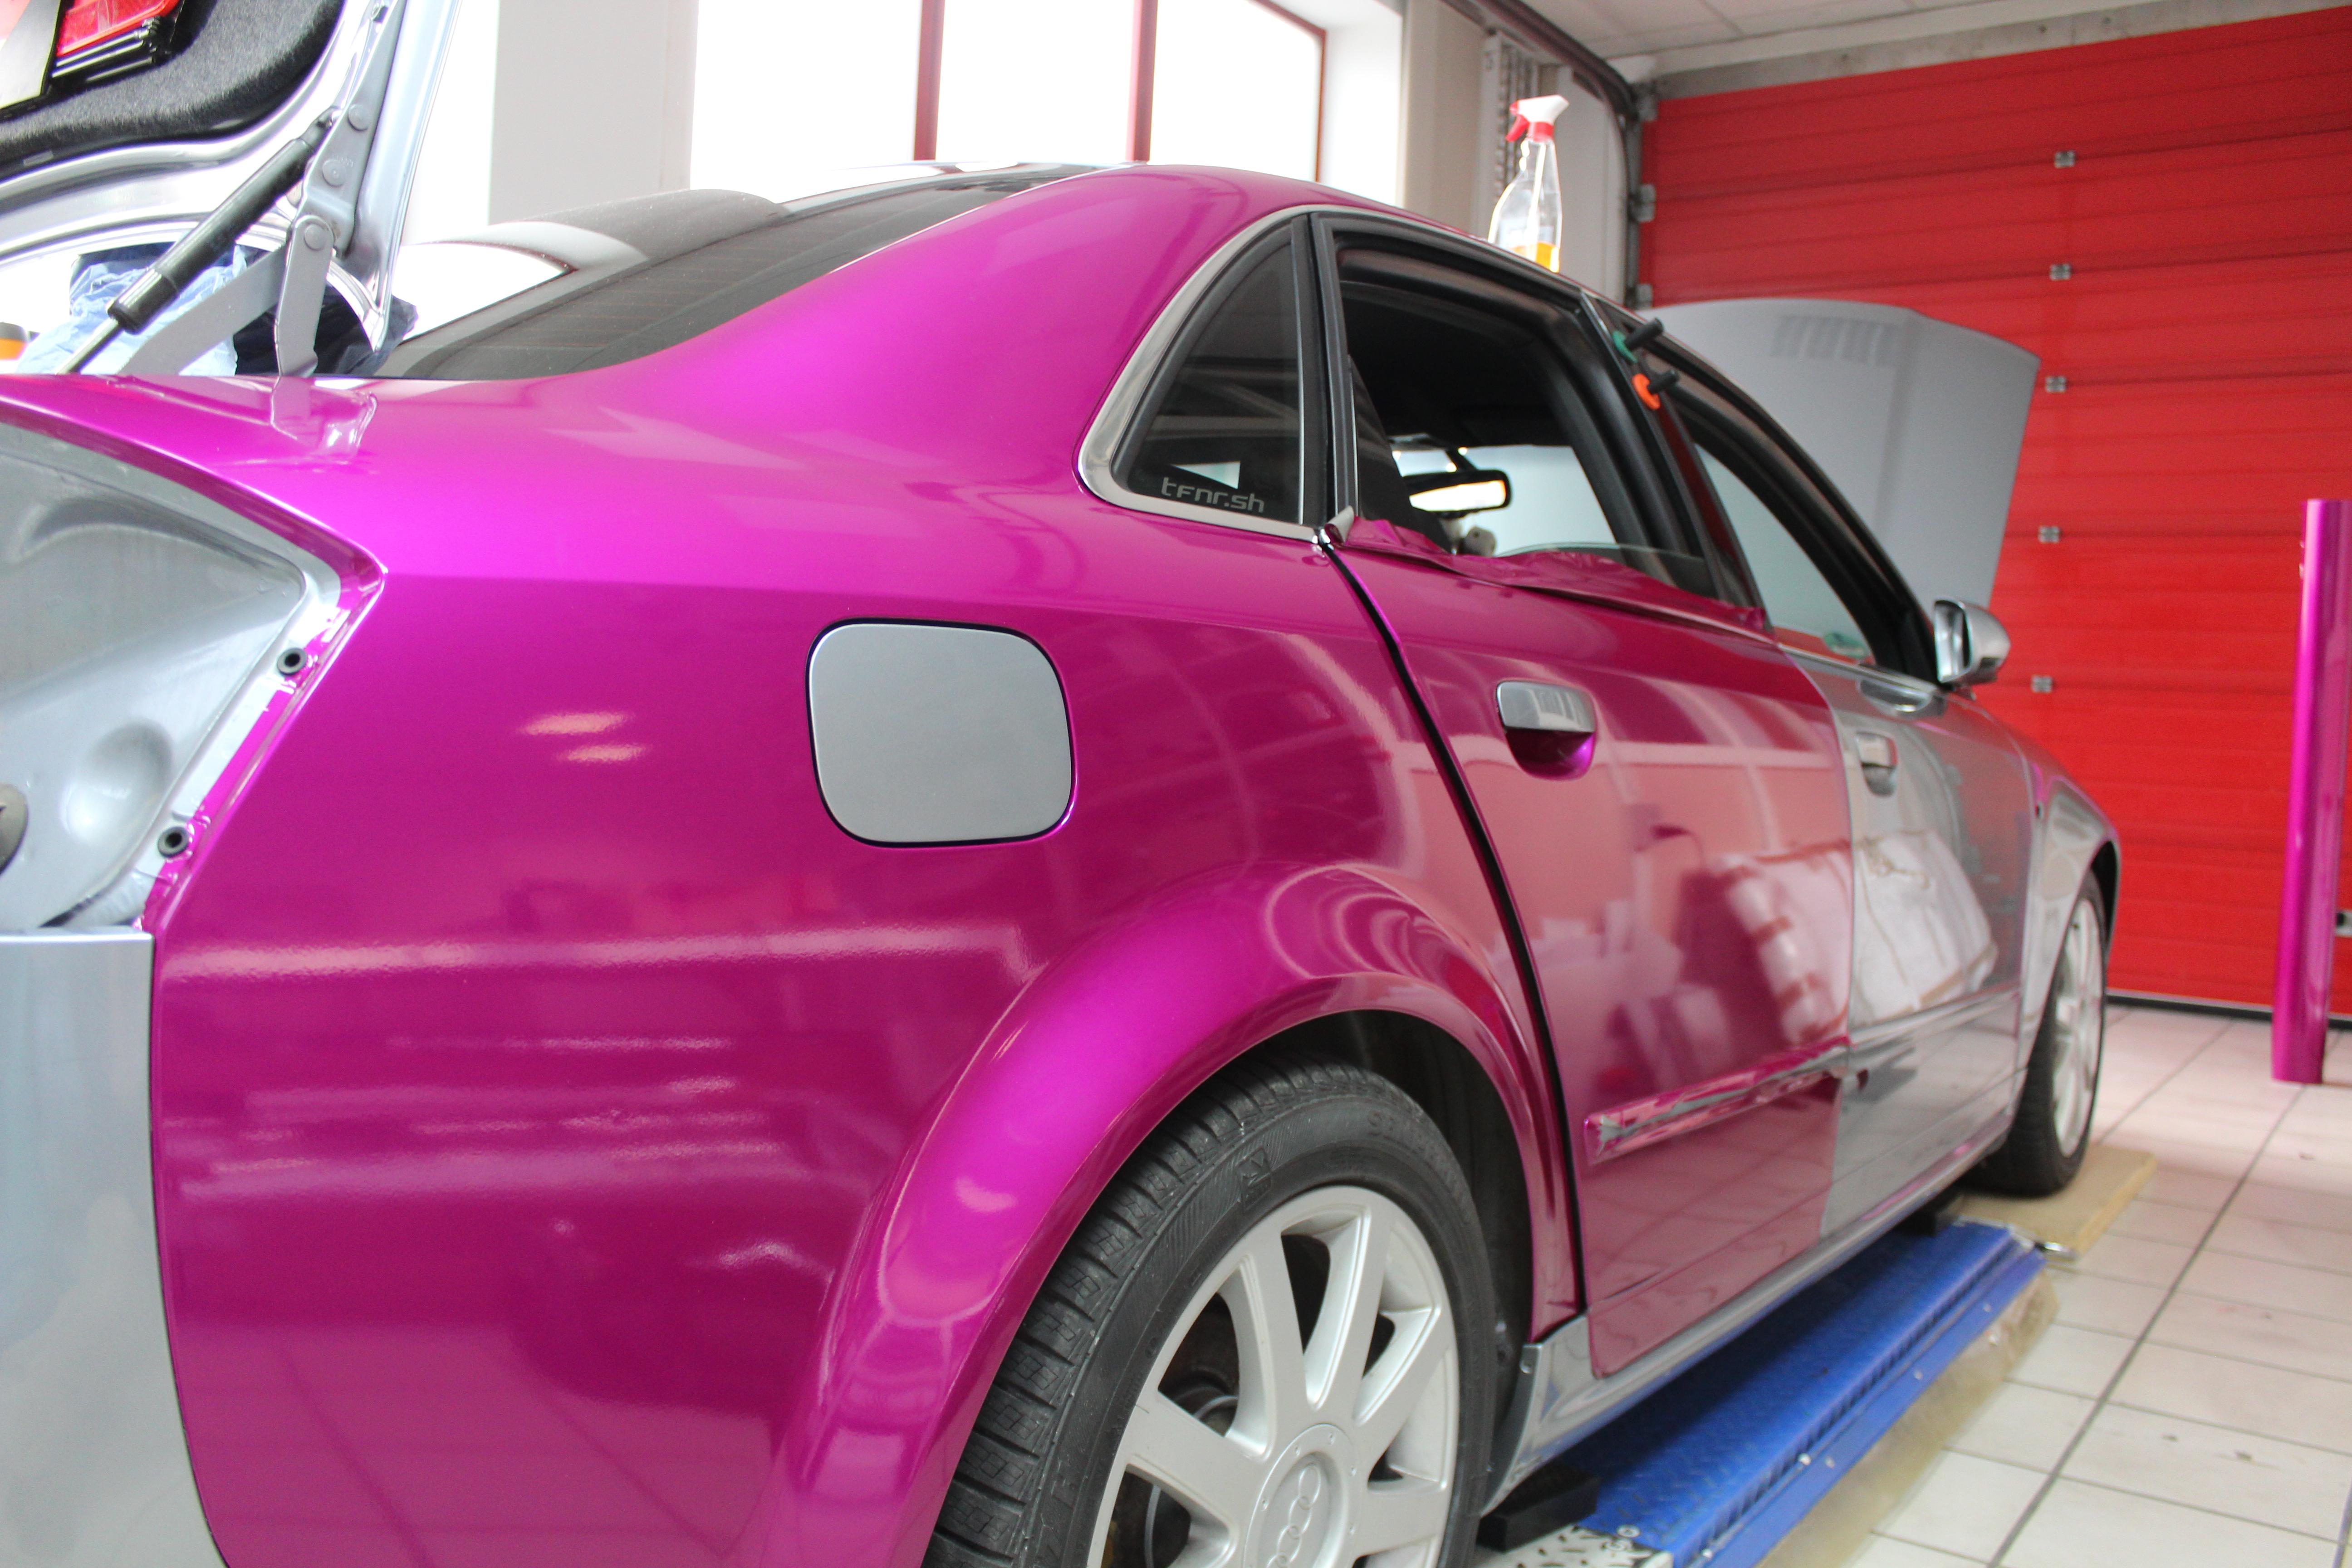 Car_Wrap_Vollflächenbeklebung_Audi_A4_5